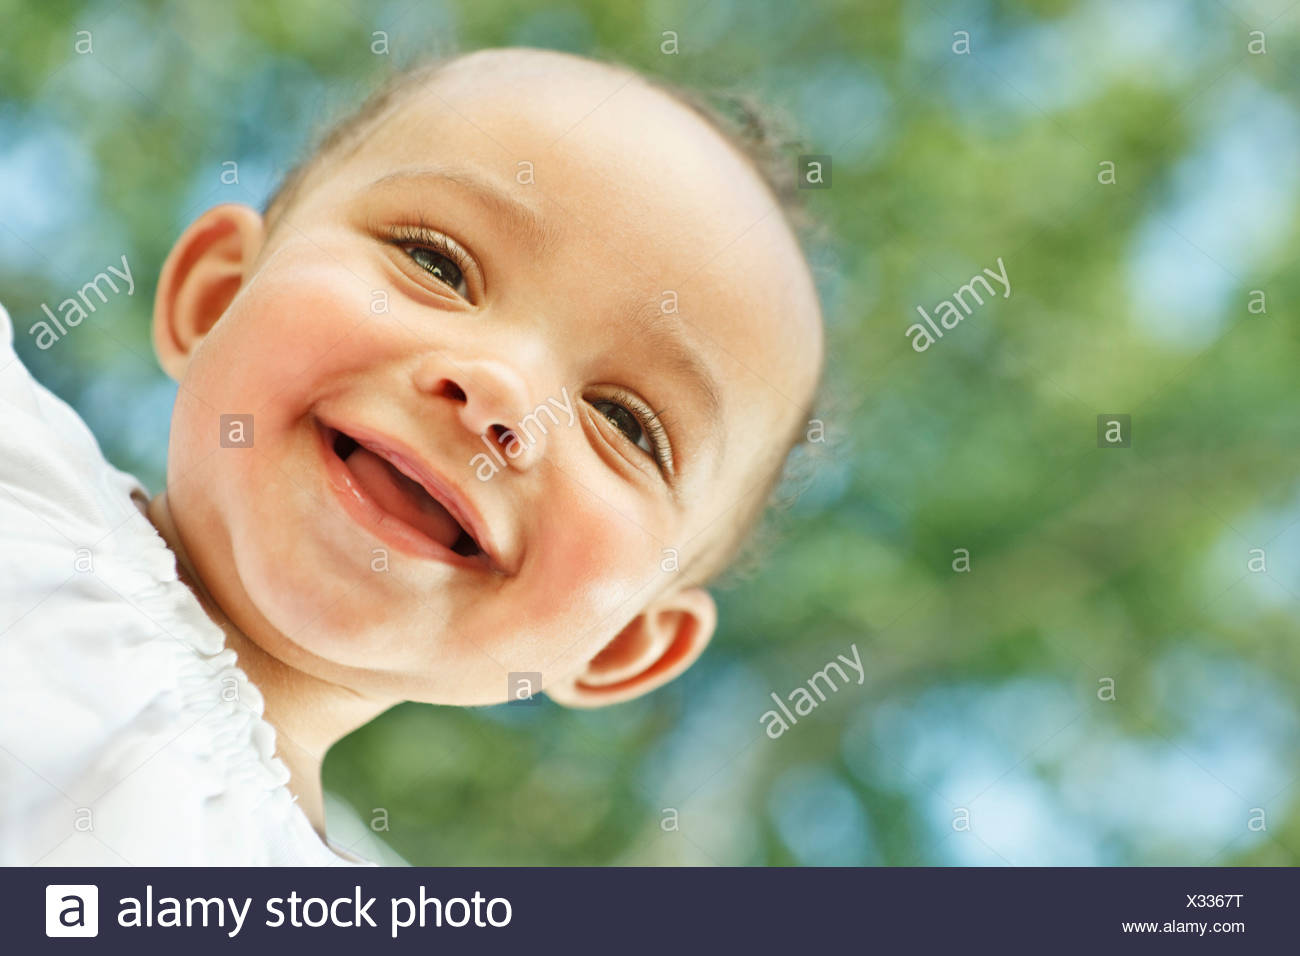 Baby smiling looking down at camera Stock Photo